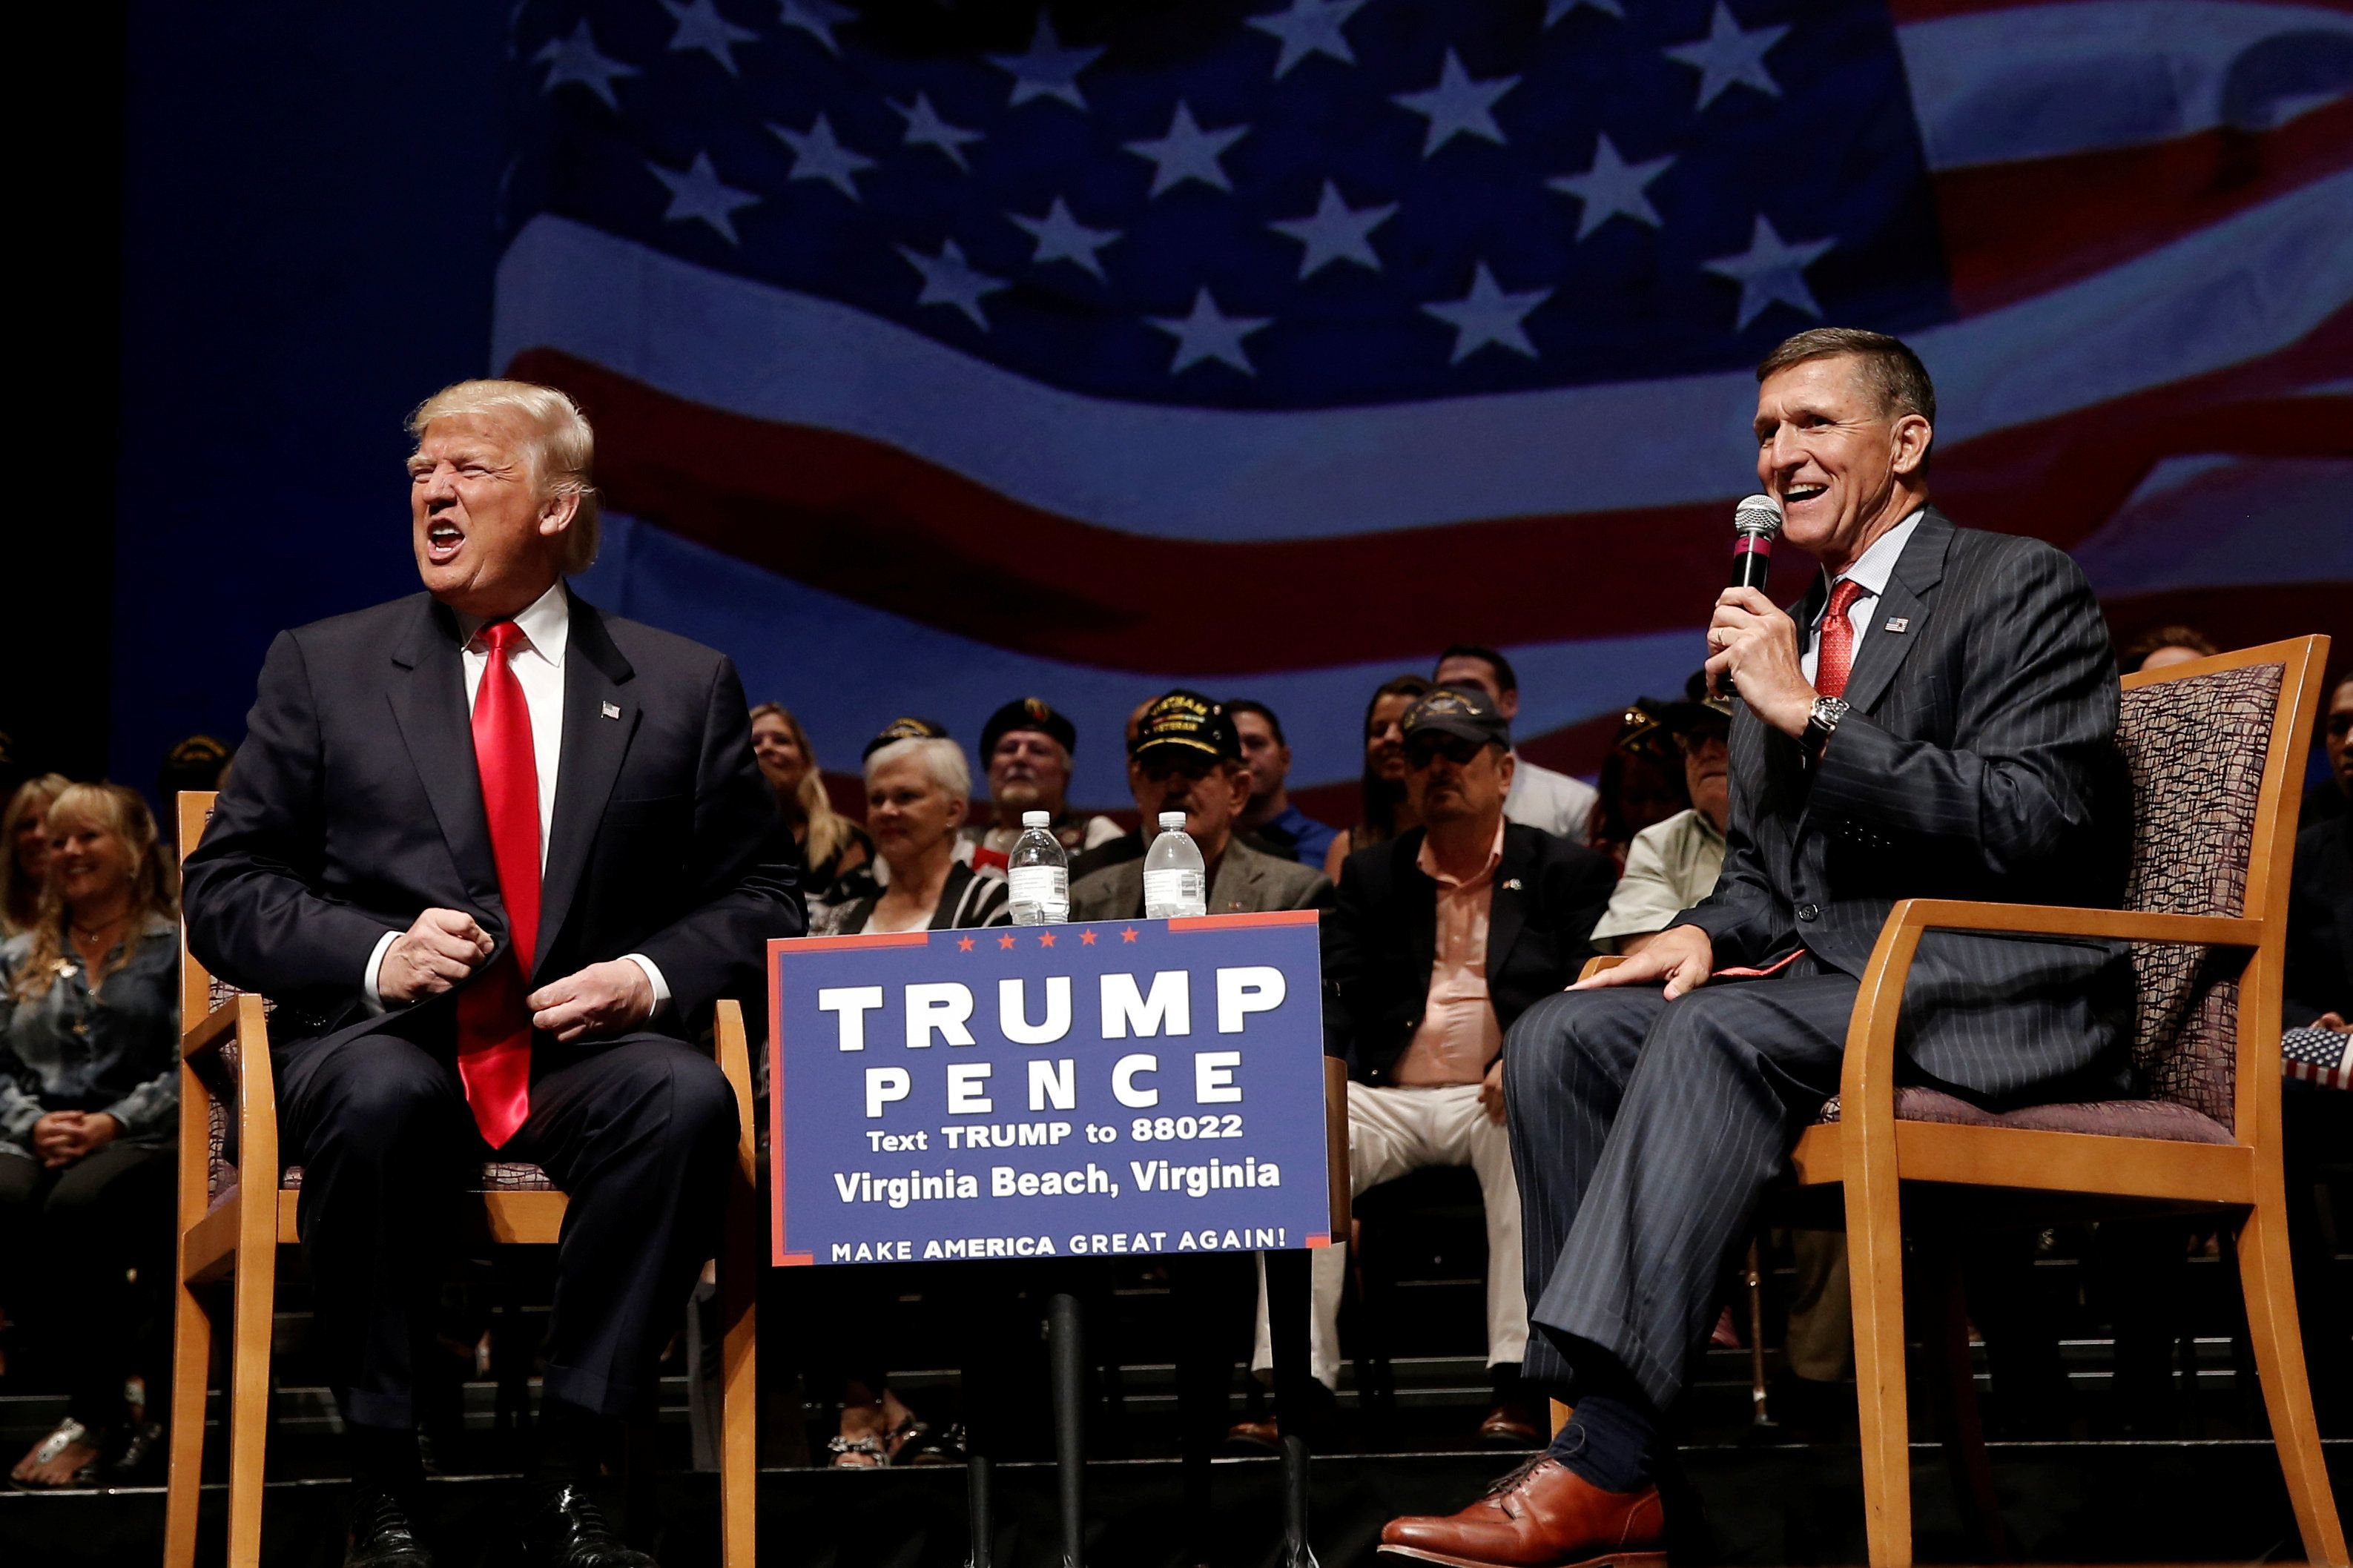 Republican presidential nominee Donald Trump (L) speaks along side retired U.S. Army Lieutenant  General Mike Flynn during a campaign town hall meeting in Virginia Beach, Virginia, U.S., September 6, 2016.  REUTERS/Mike Segar